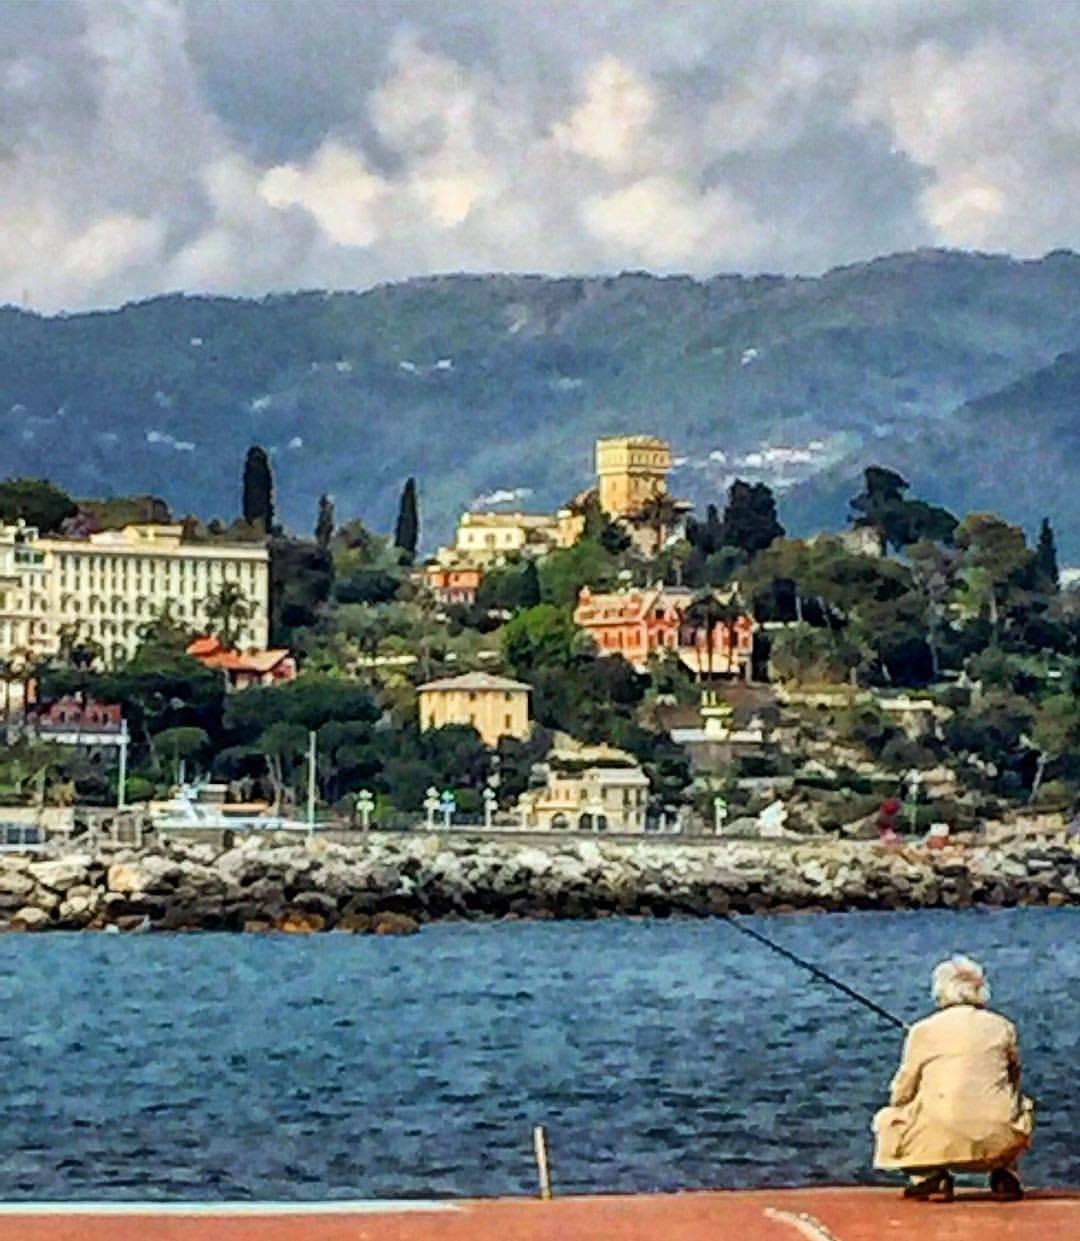 Fishing for lunch.  #italy #liguria #fishing #italianlife  (at Porto Santa Margherita Ligure)